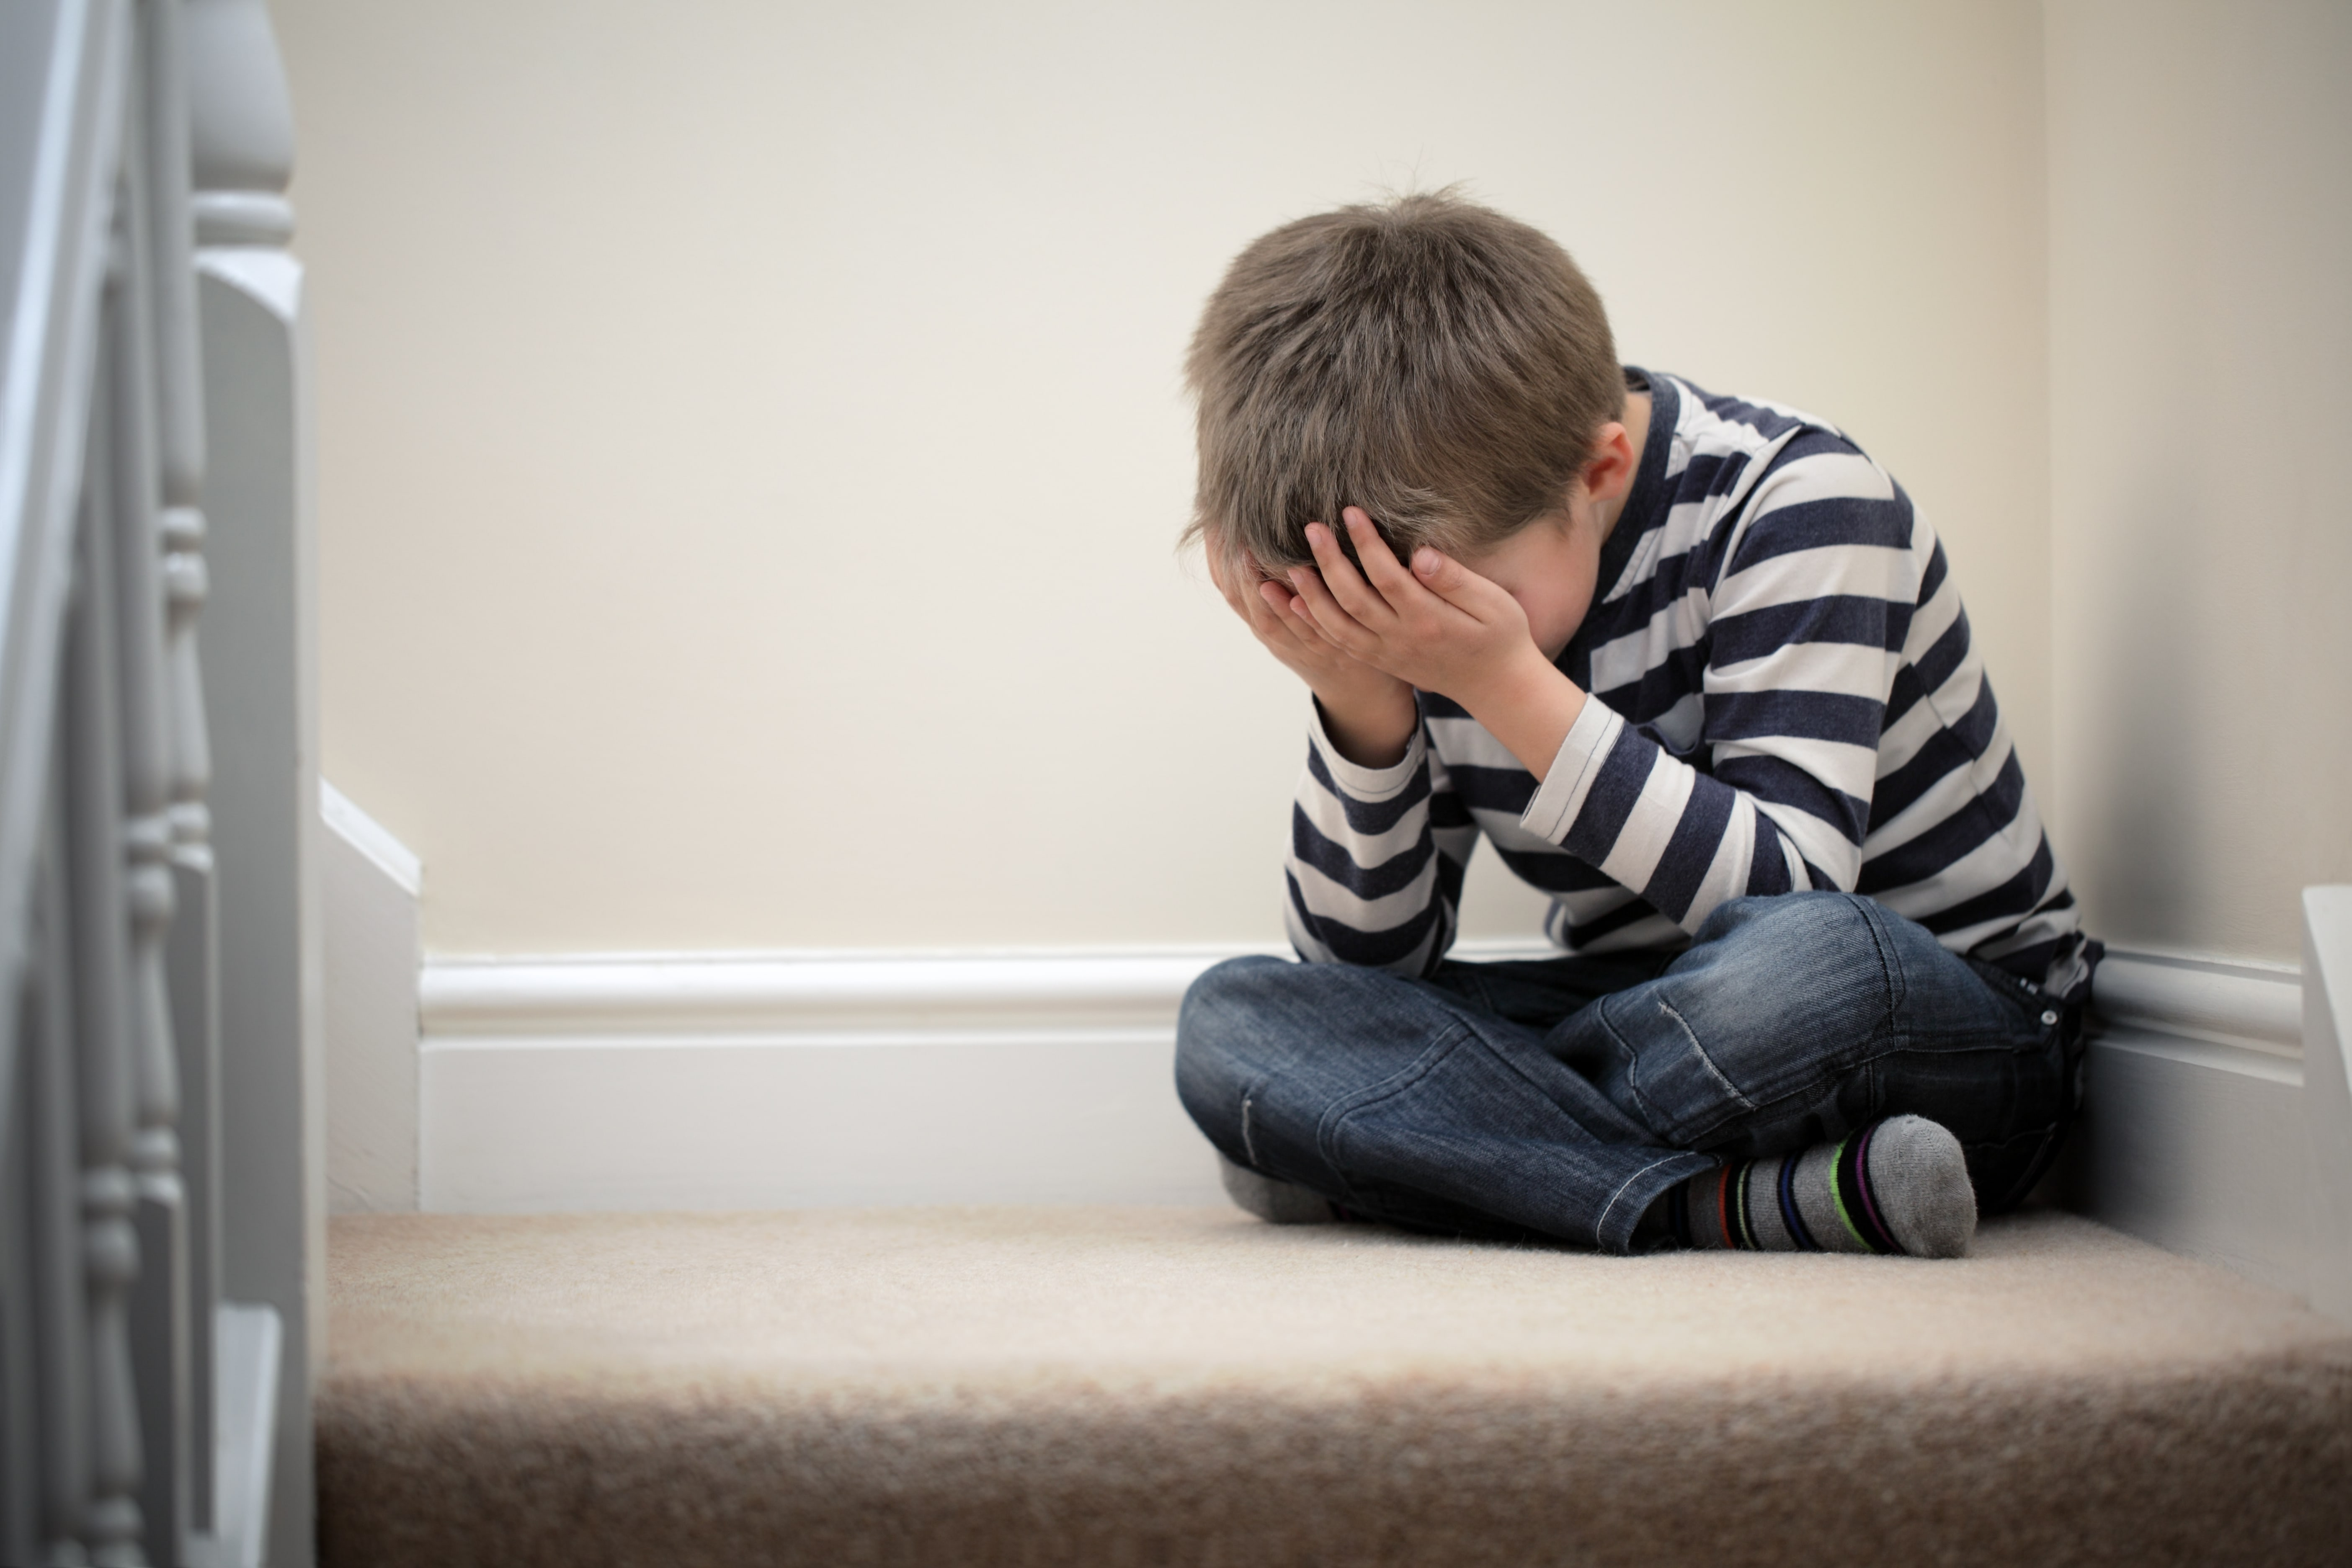 childrens-alcohol-disorder-min-min.jpg